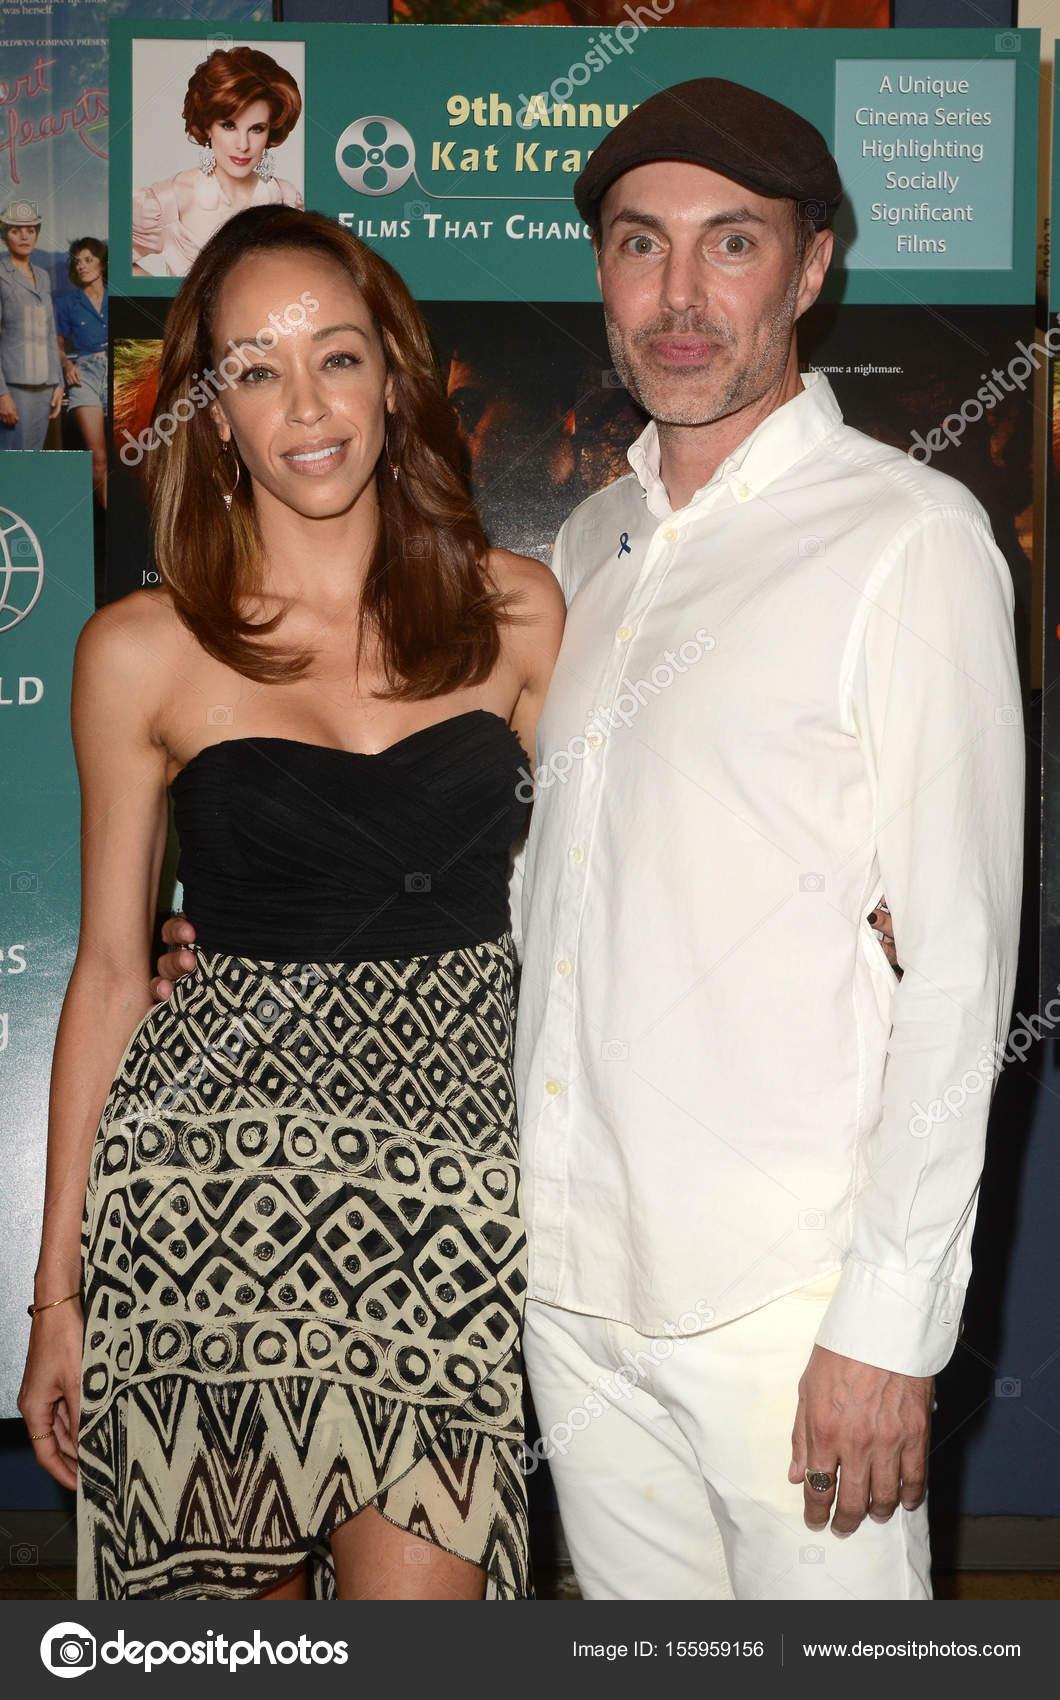 Rupert Graves (born 1963) Hot movies Laura Michelle Kelly,Leelee Sobieski